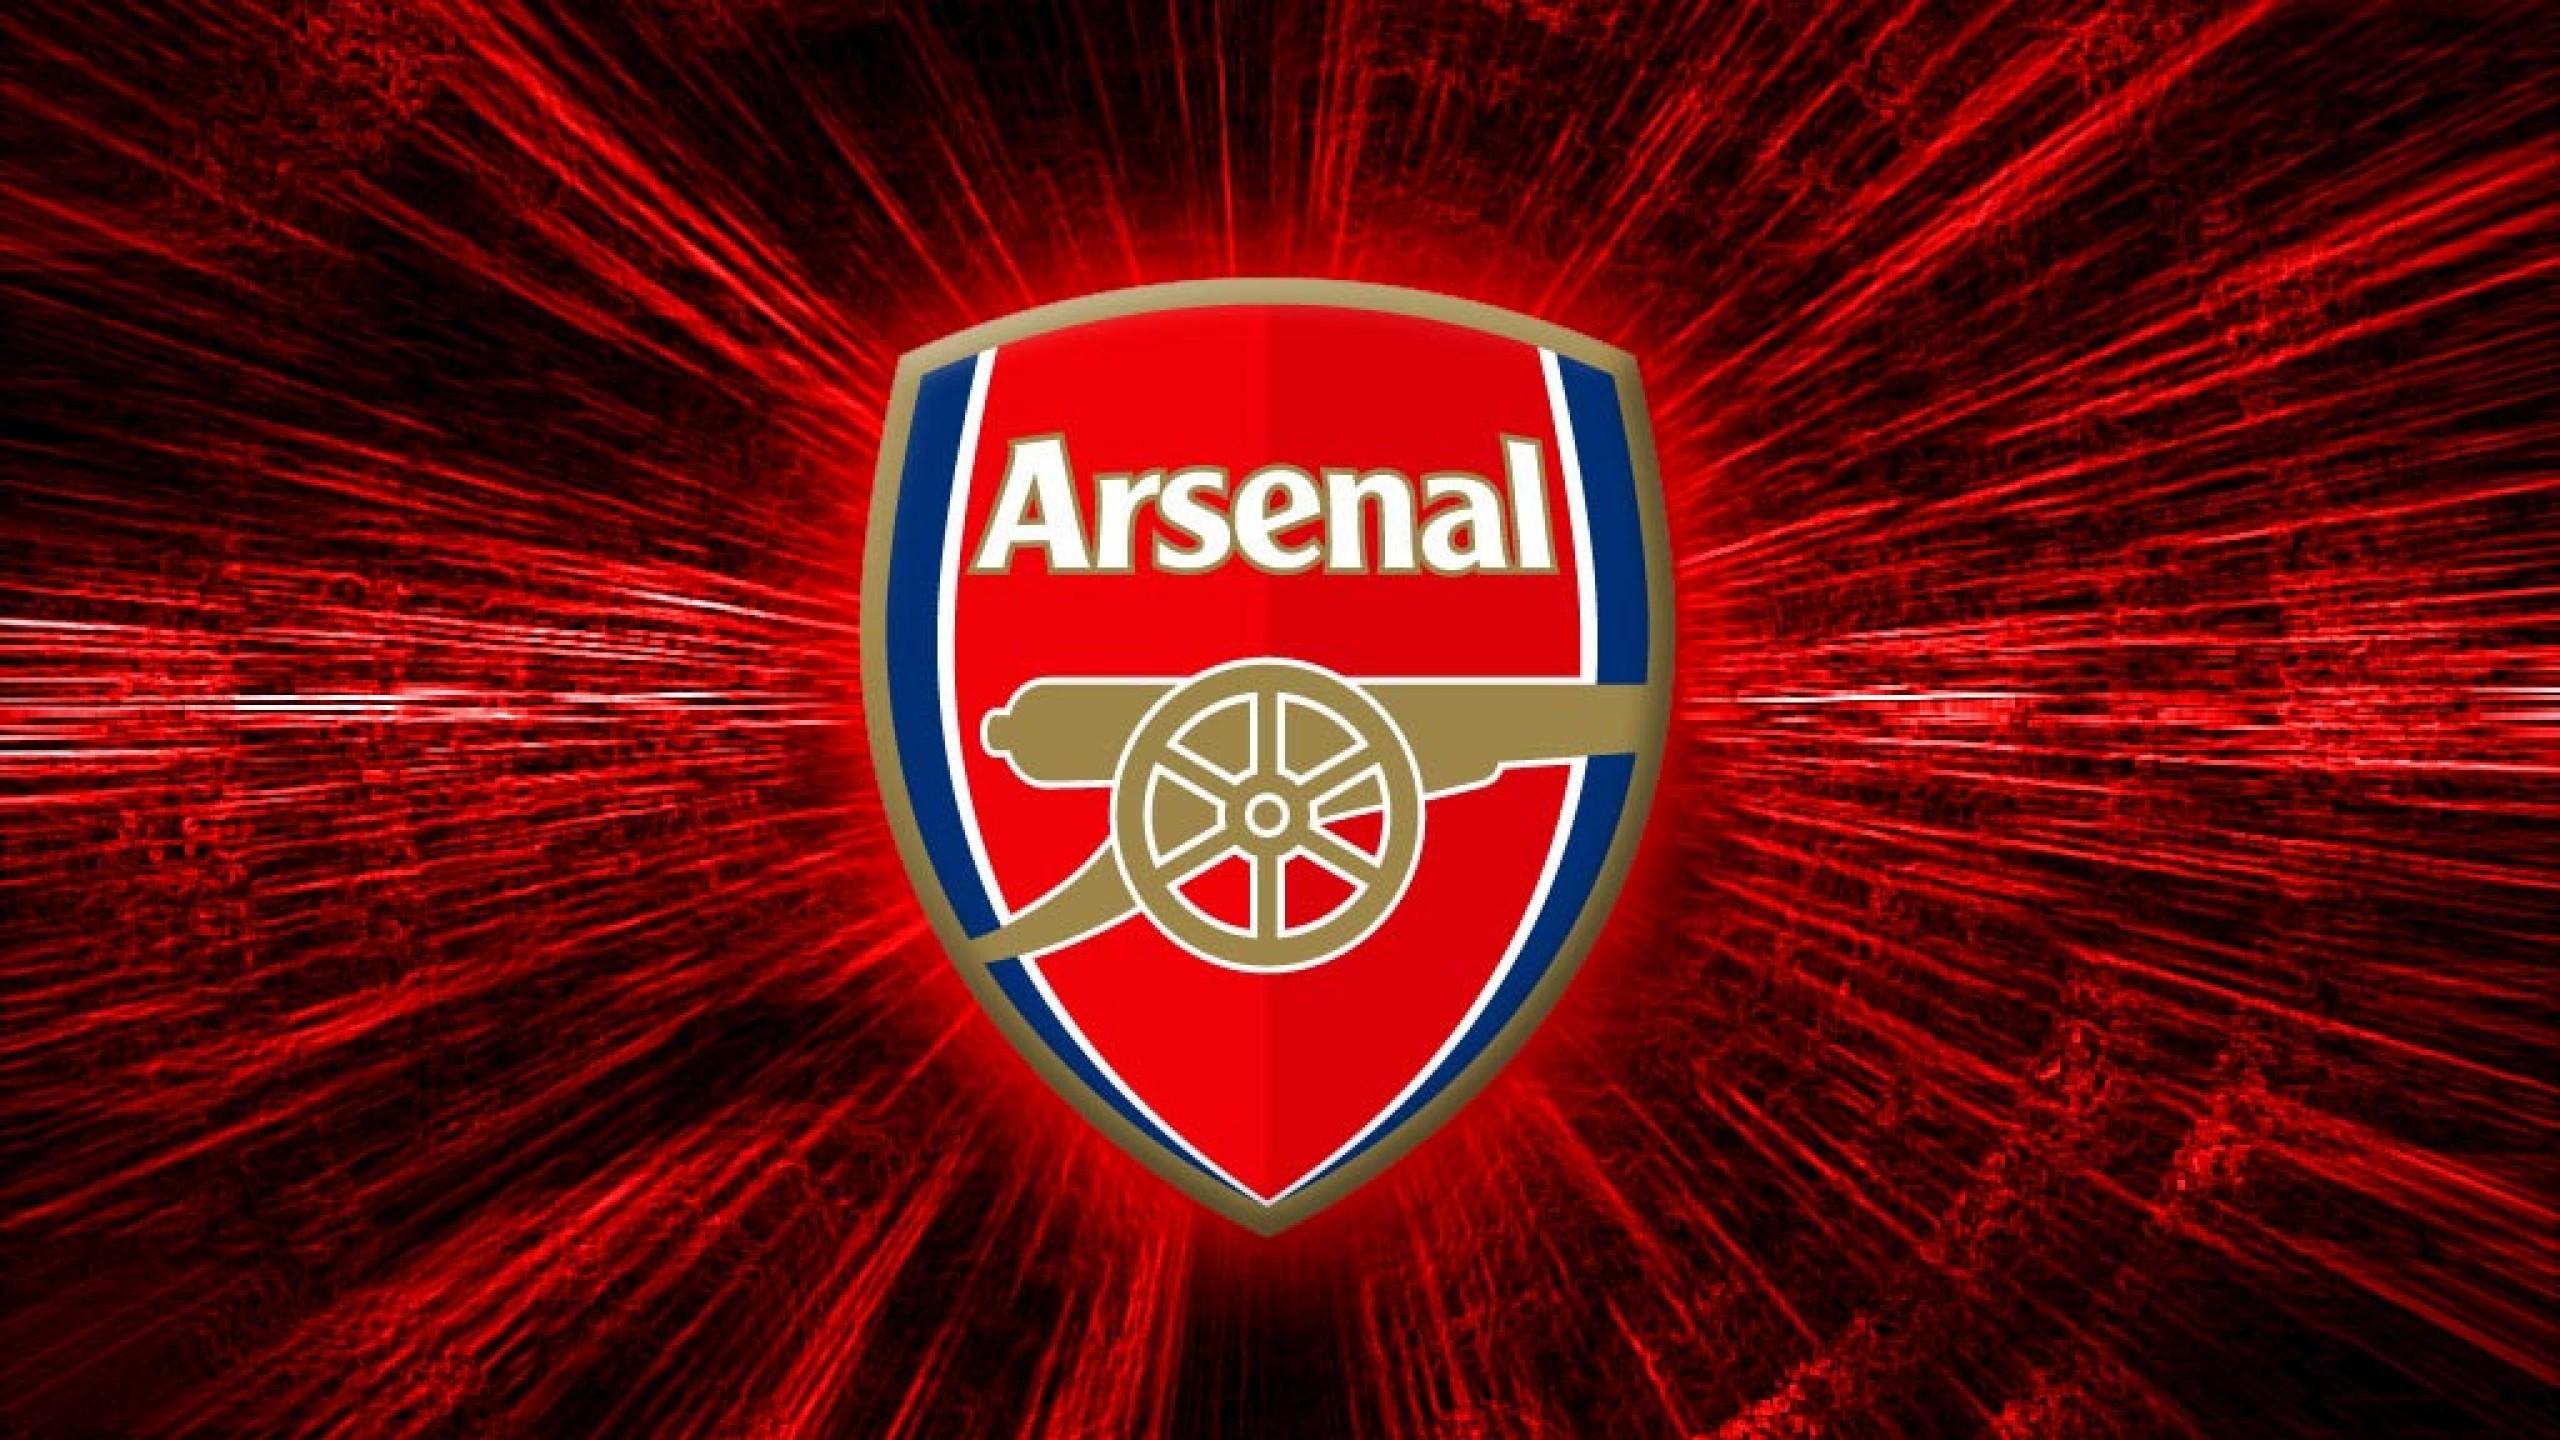 Arsenal Wallpaper 4k: Arsenal FC Wallpaper 2018 ·①